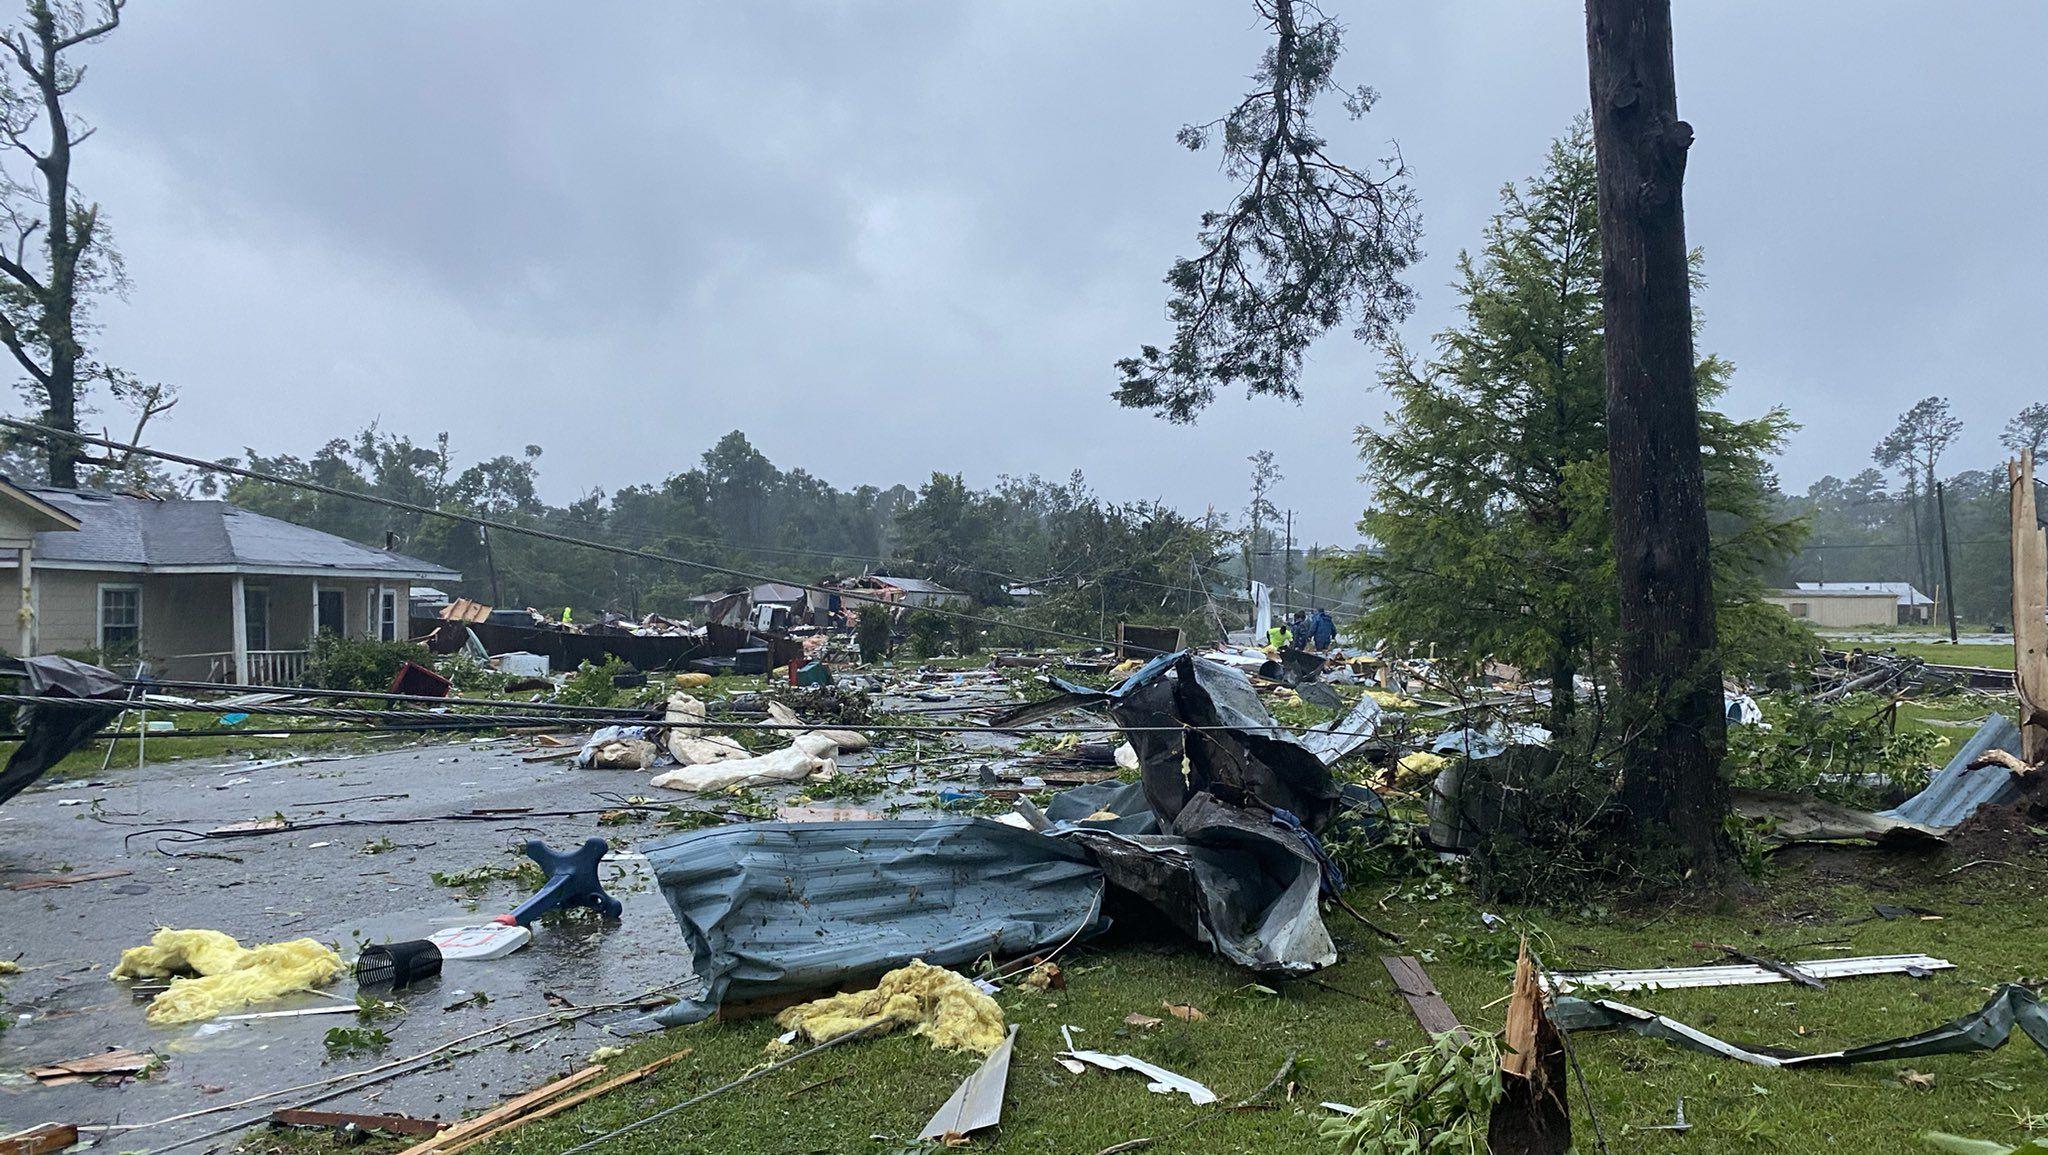 TS Claudette: Tornado damage in Brewton, Alabama